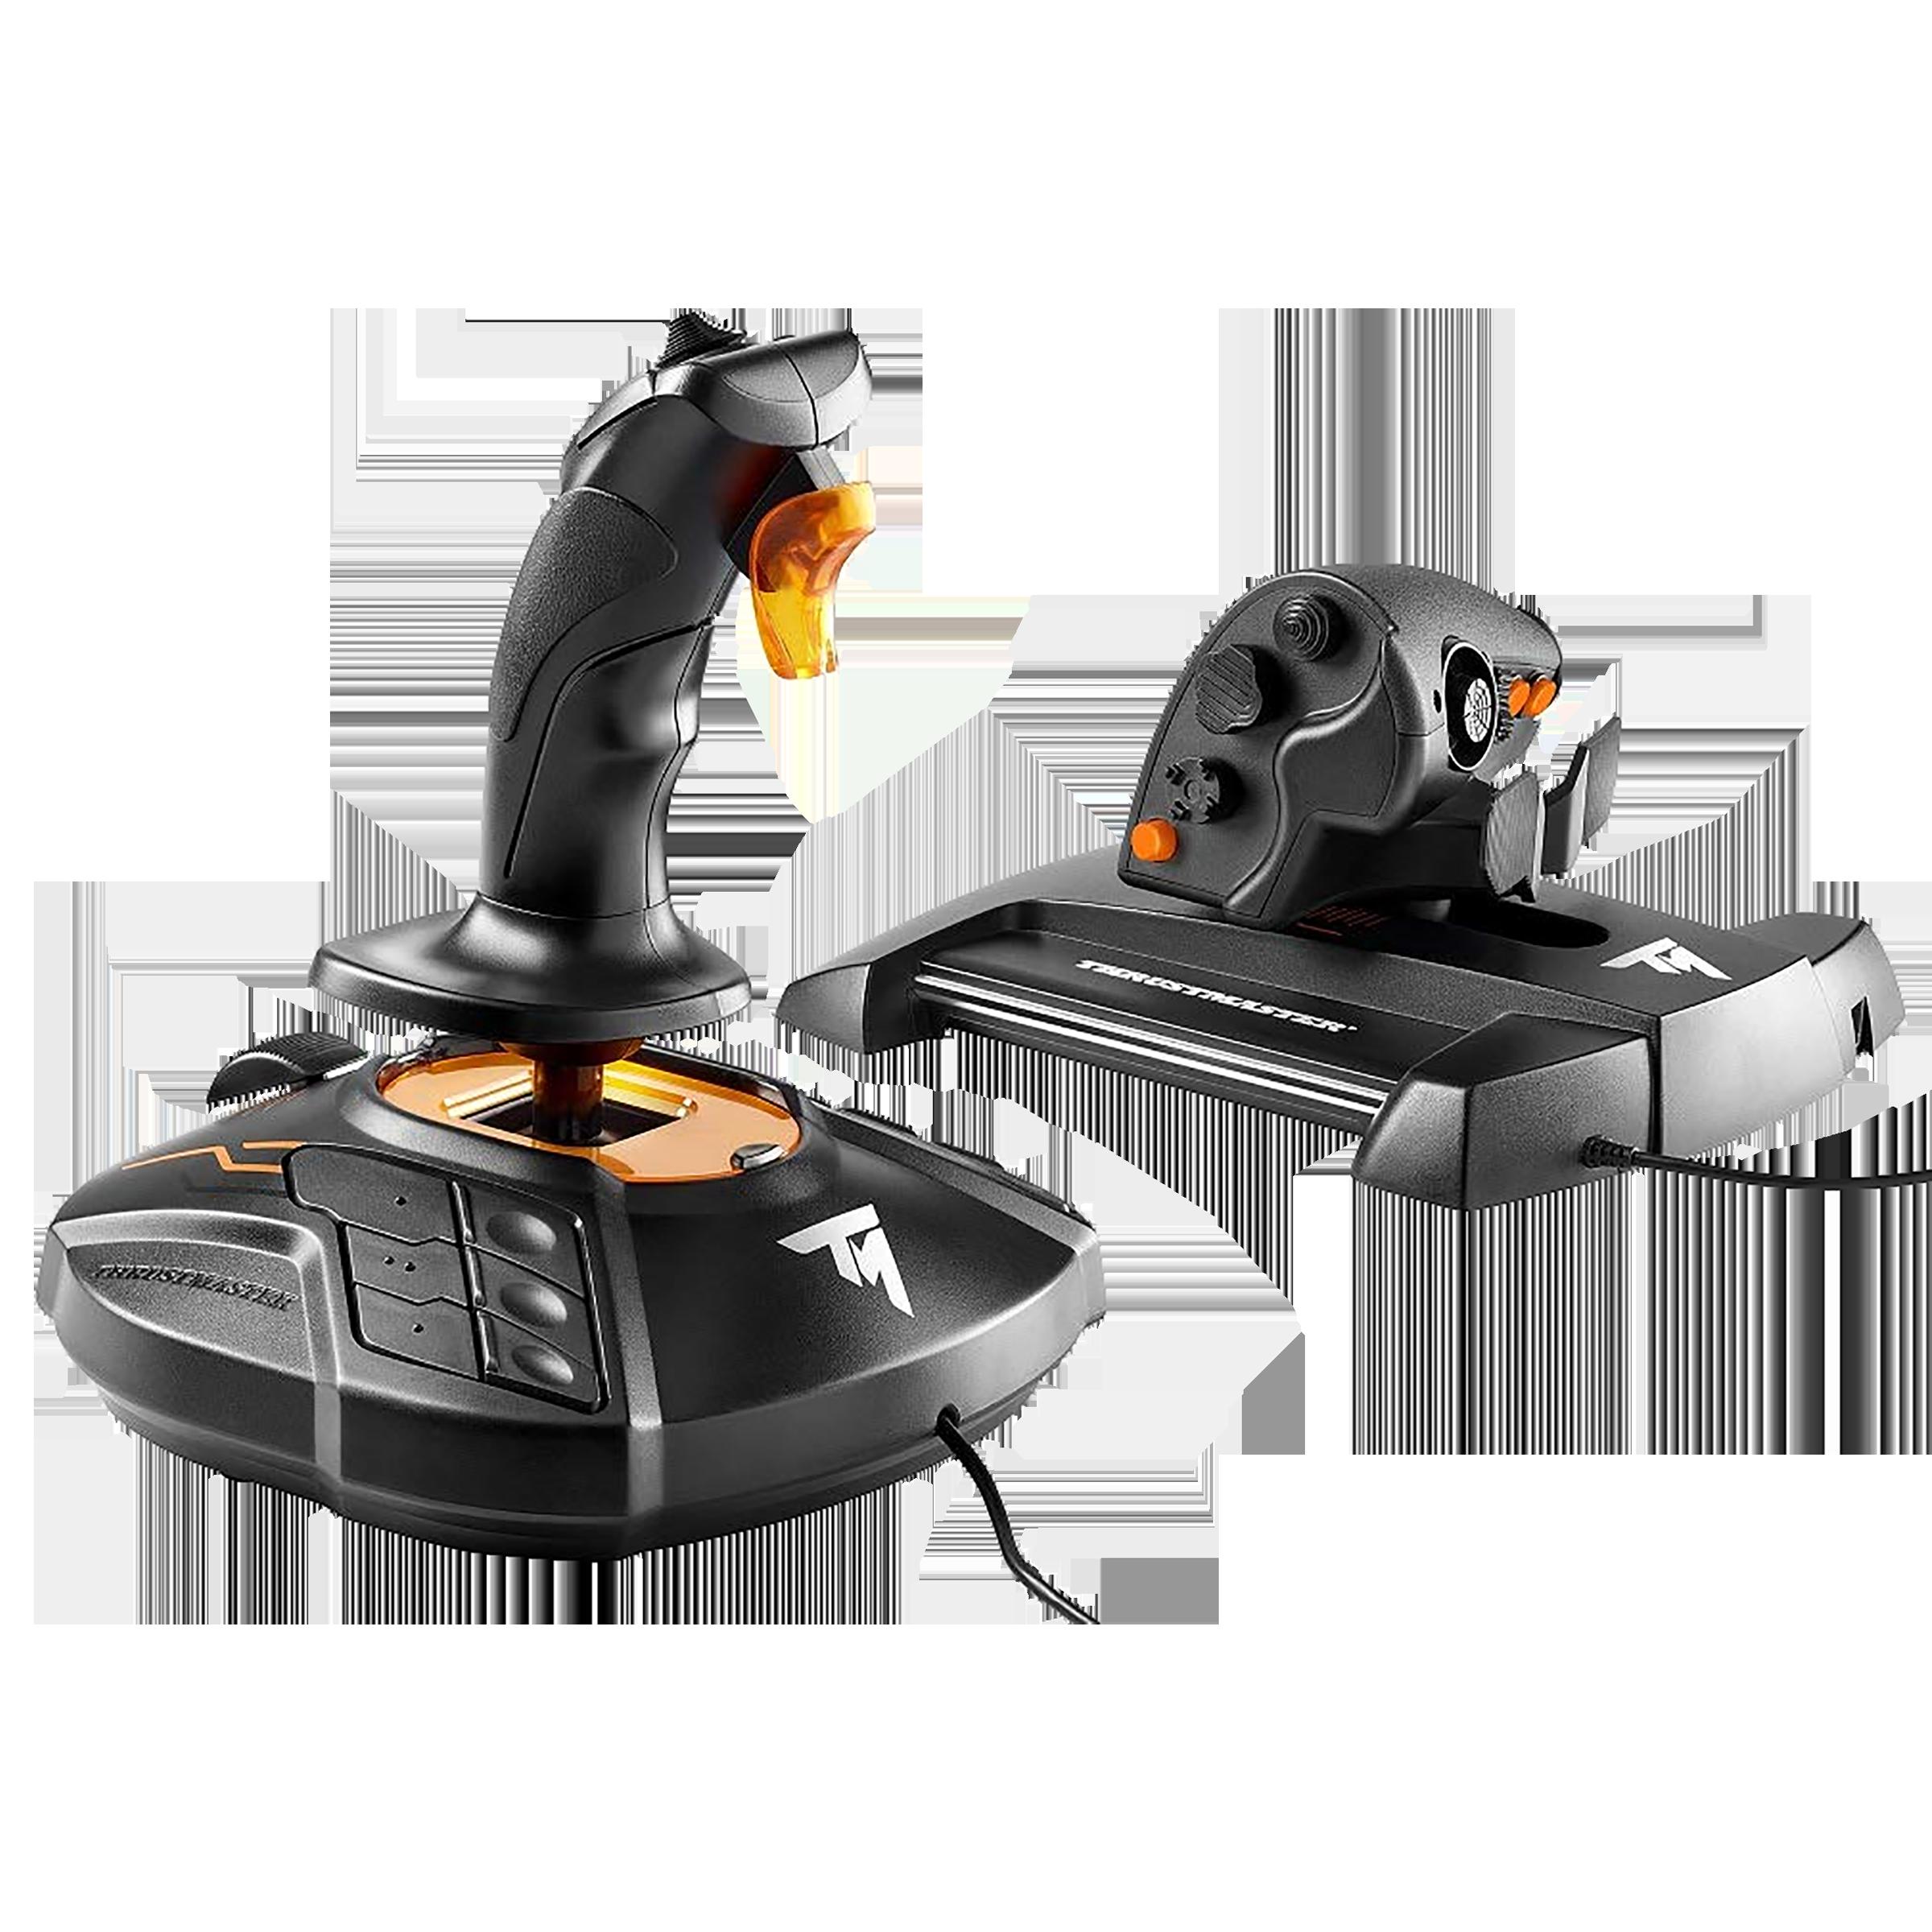 Thrustmaster Joystick For PC (Magnetic Sensors On Stick, T.16000M FCS Hotas, Black/Orange)_1